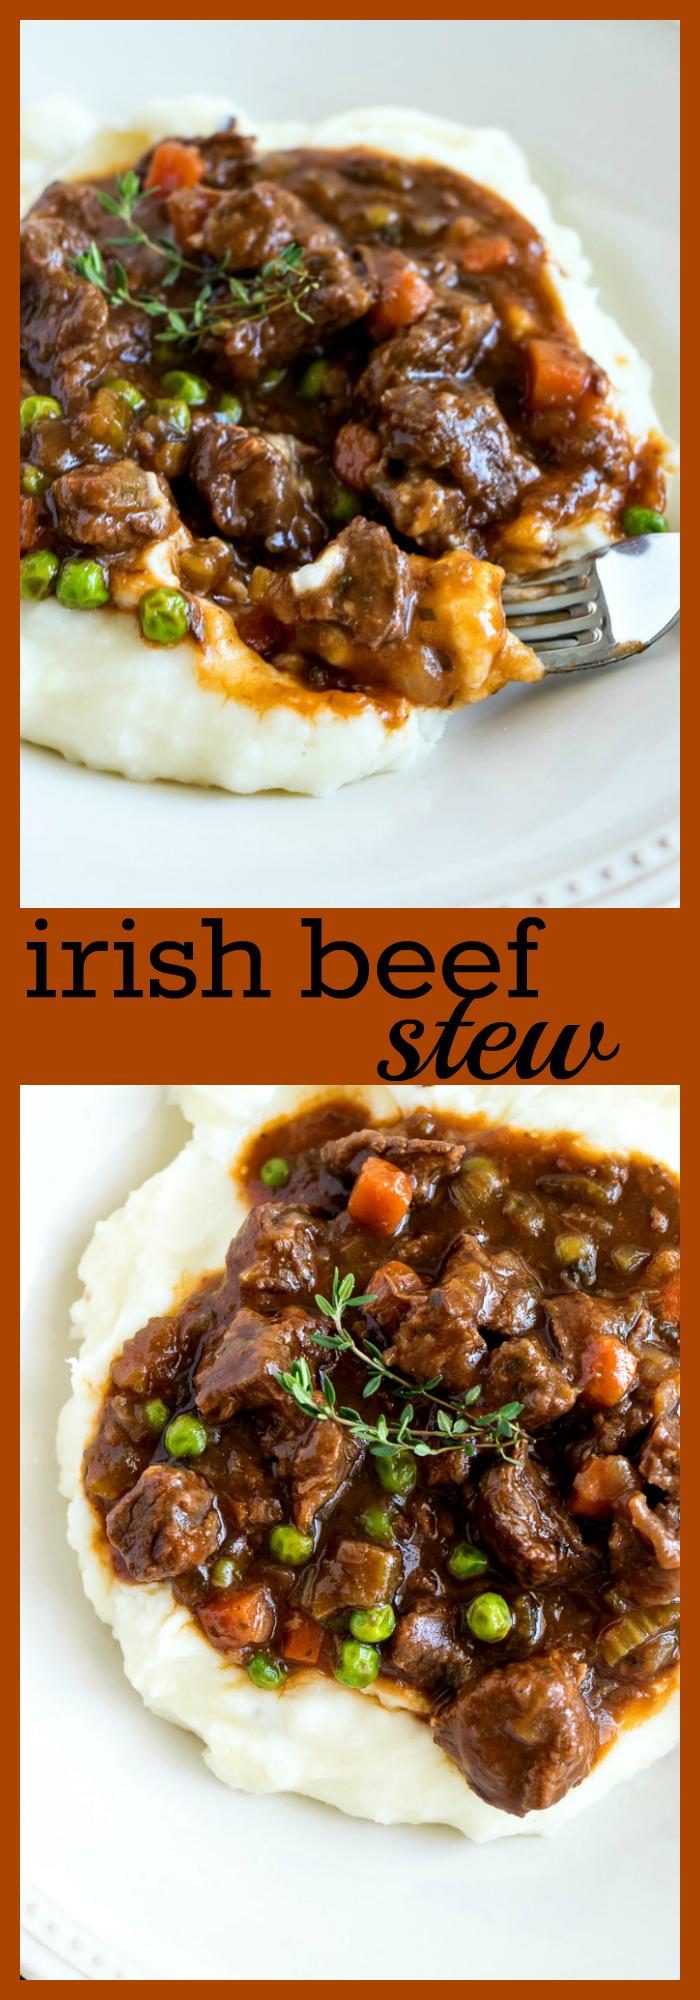 Irish Beef Stew Beef Stew Meat Recipes Beef Stew Recipe Stew Meat Recipes